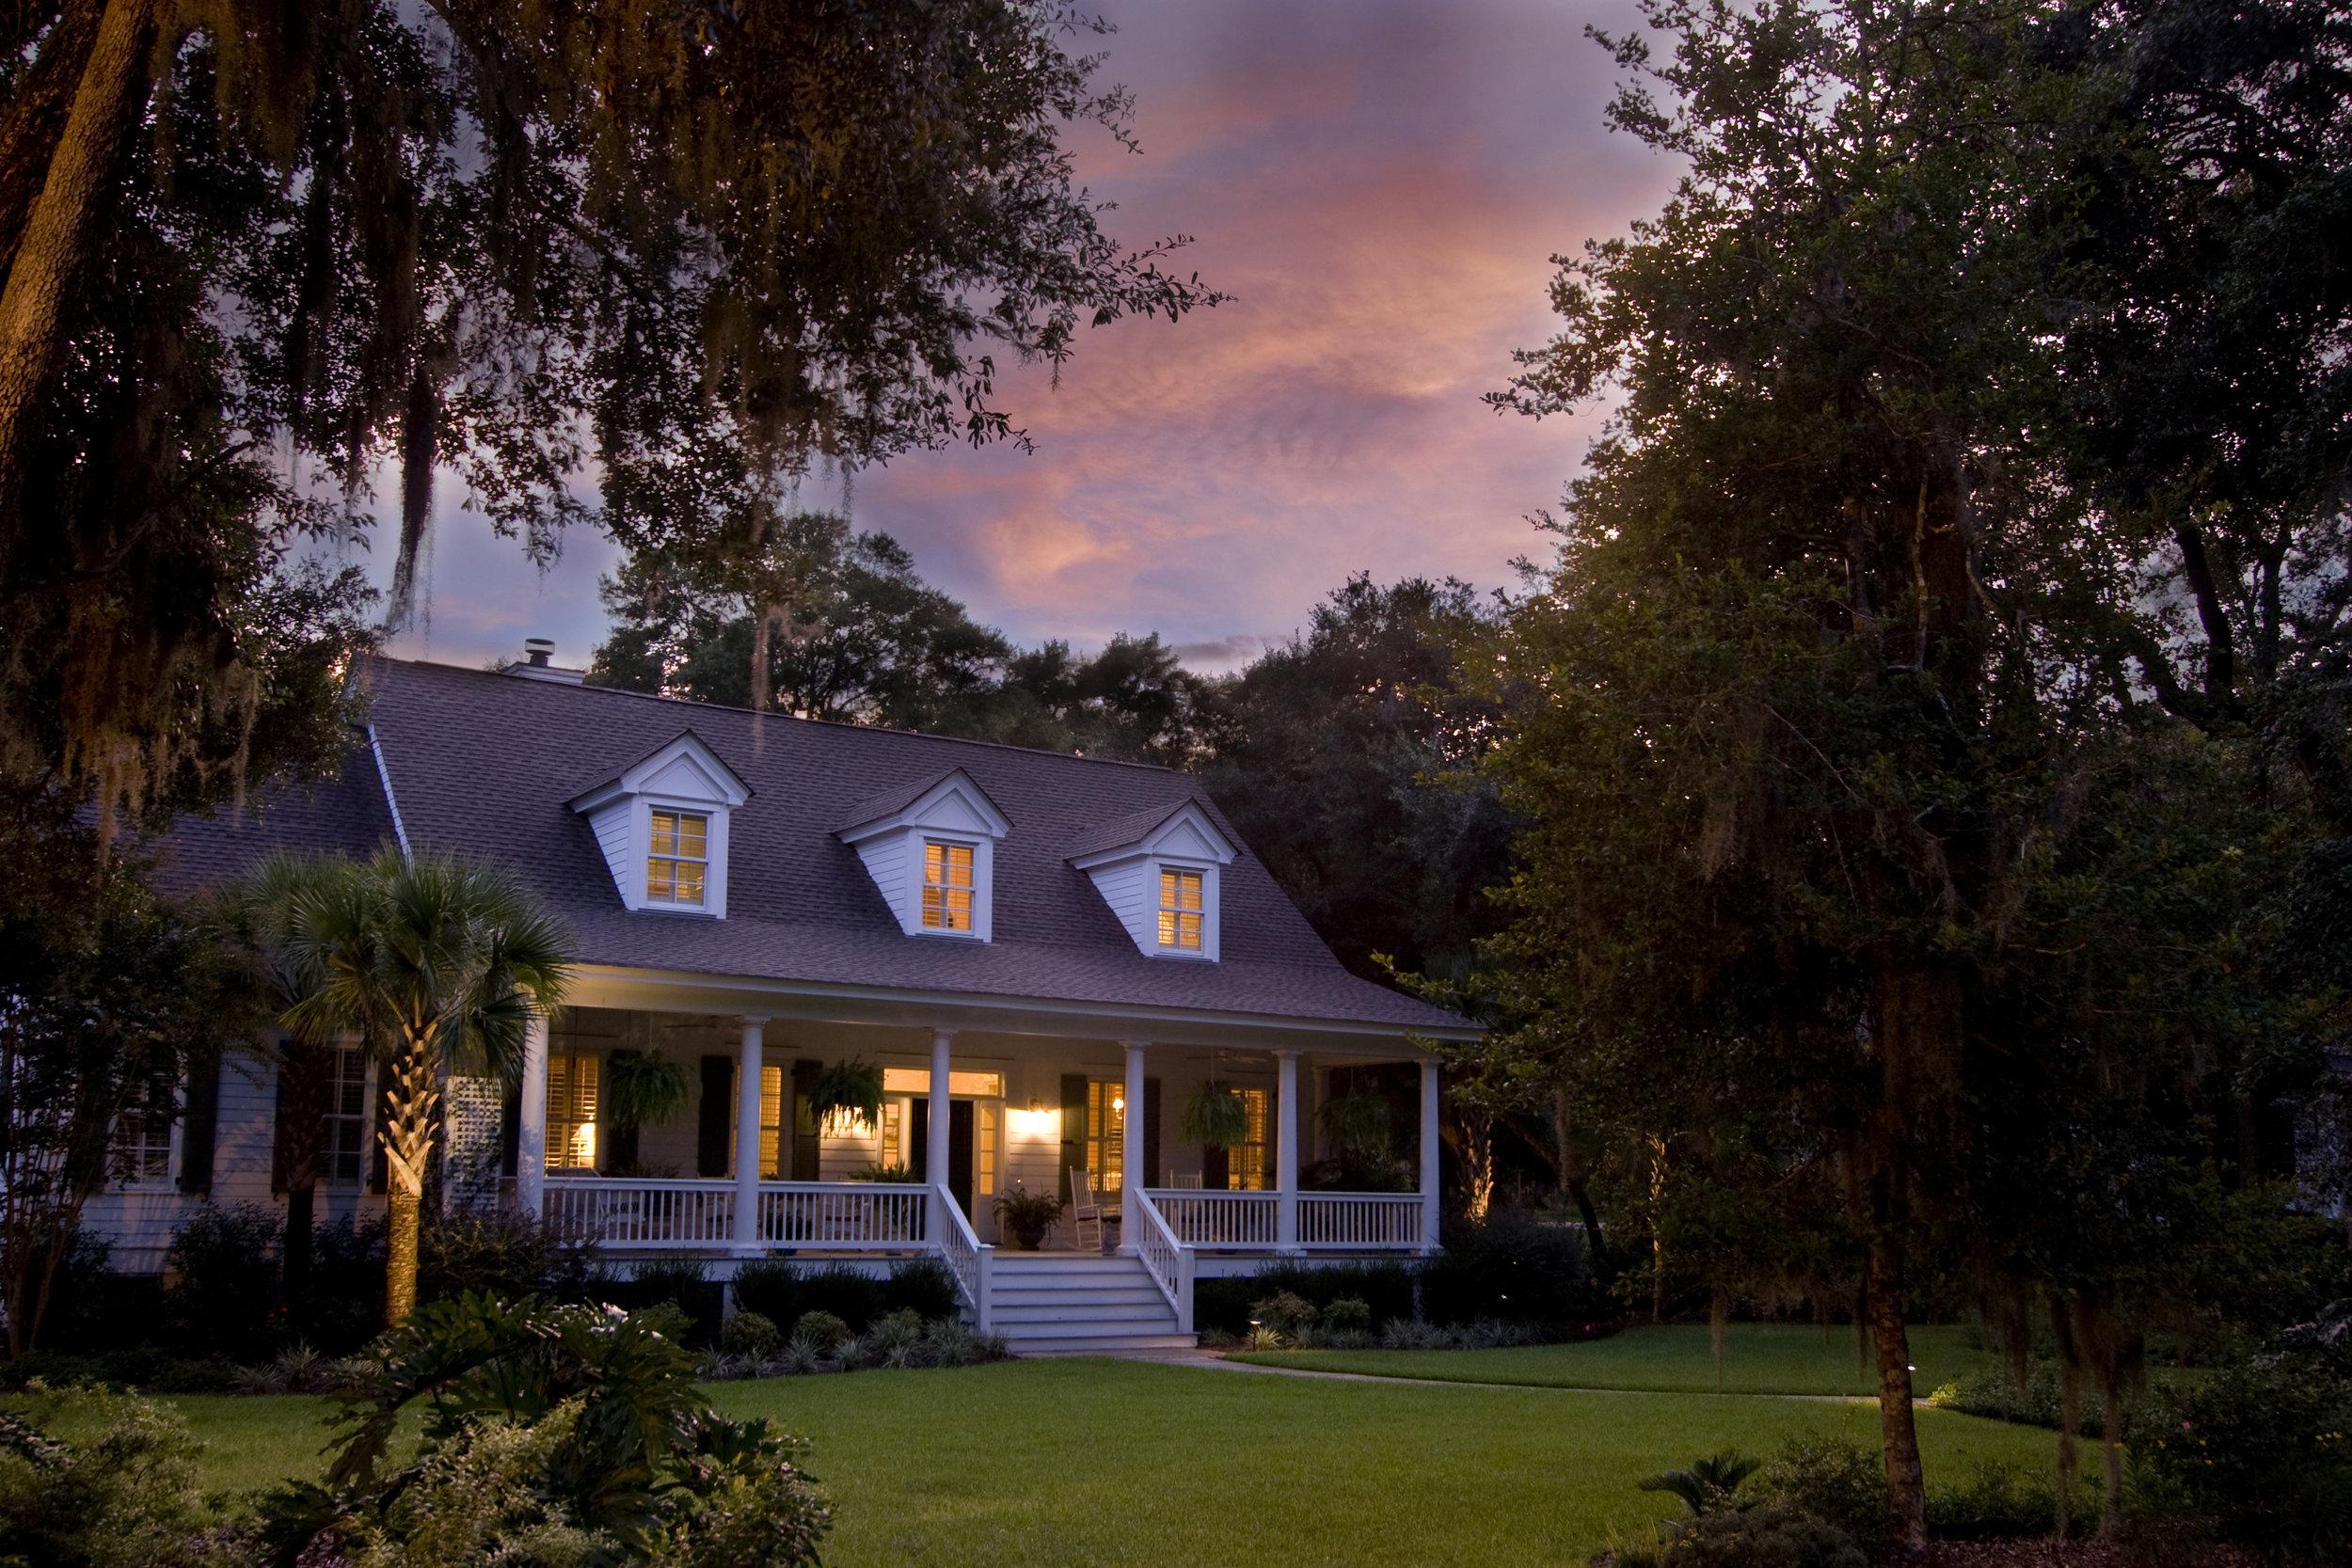 classic-home-at-sunset-PTLA347.jpg